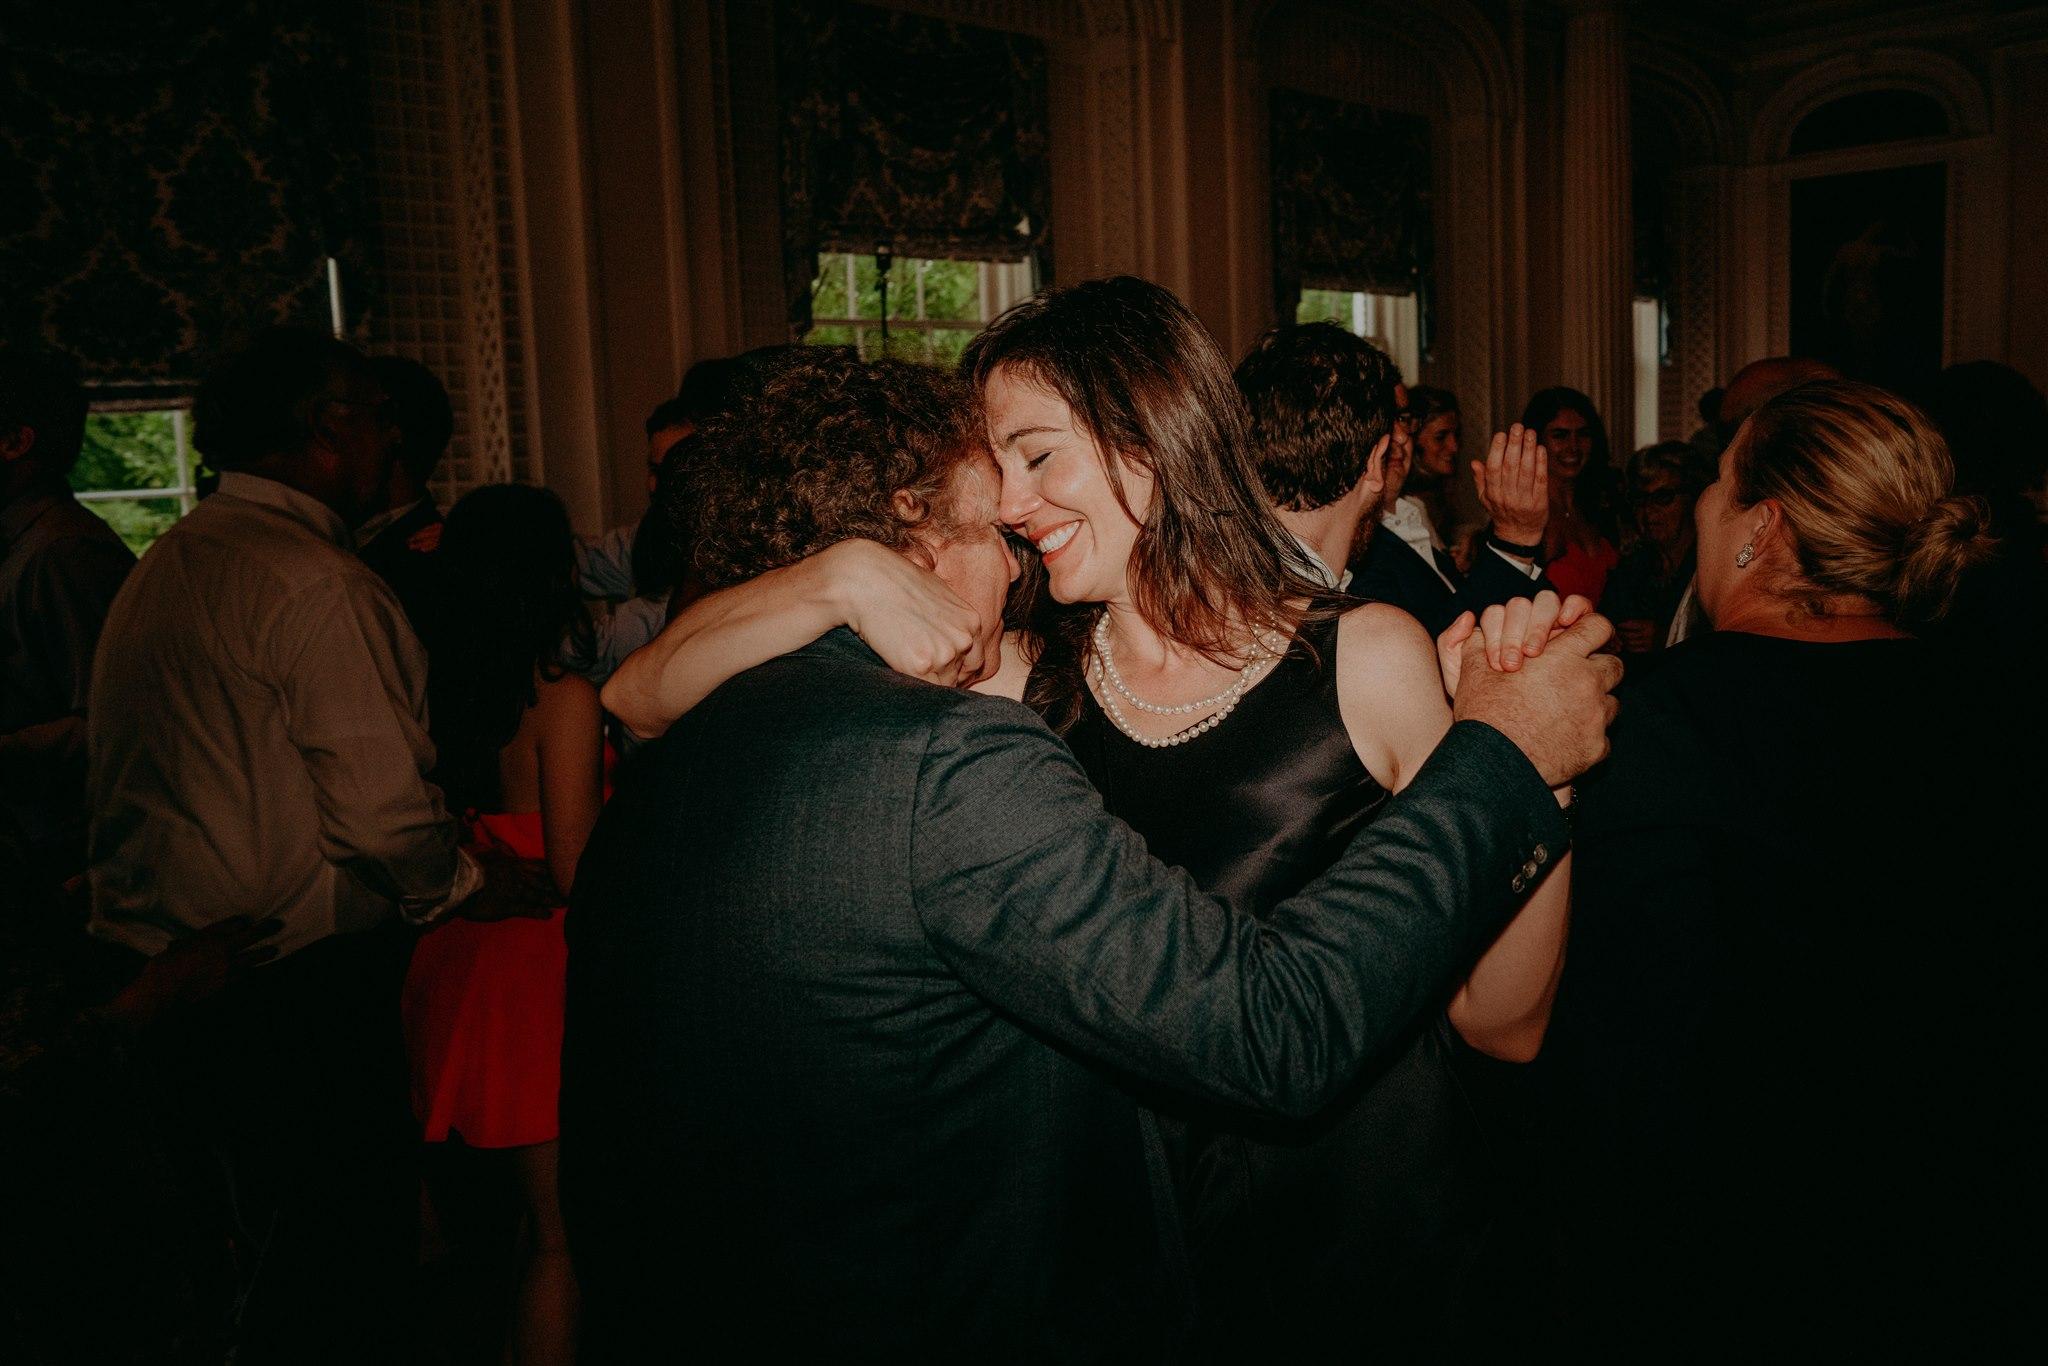 Chellise_Michael_Photography_Hudson_Valley_Wedding_Photographer_Otesaga_Hotel-6062.jpg